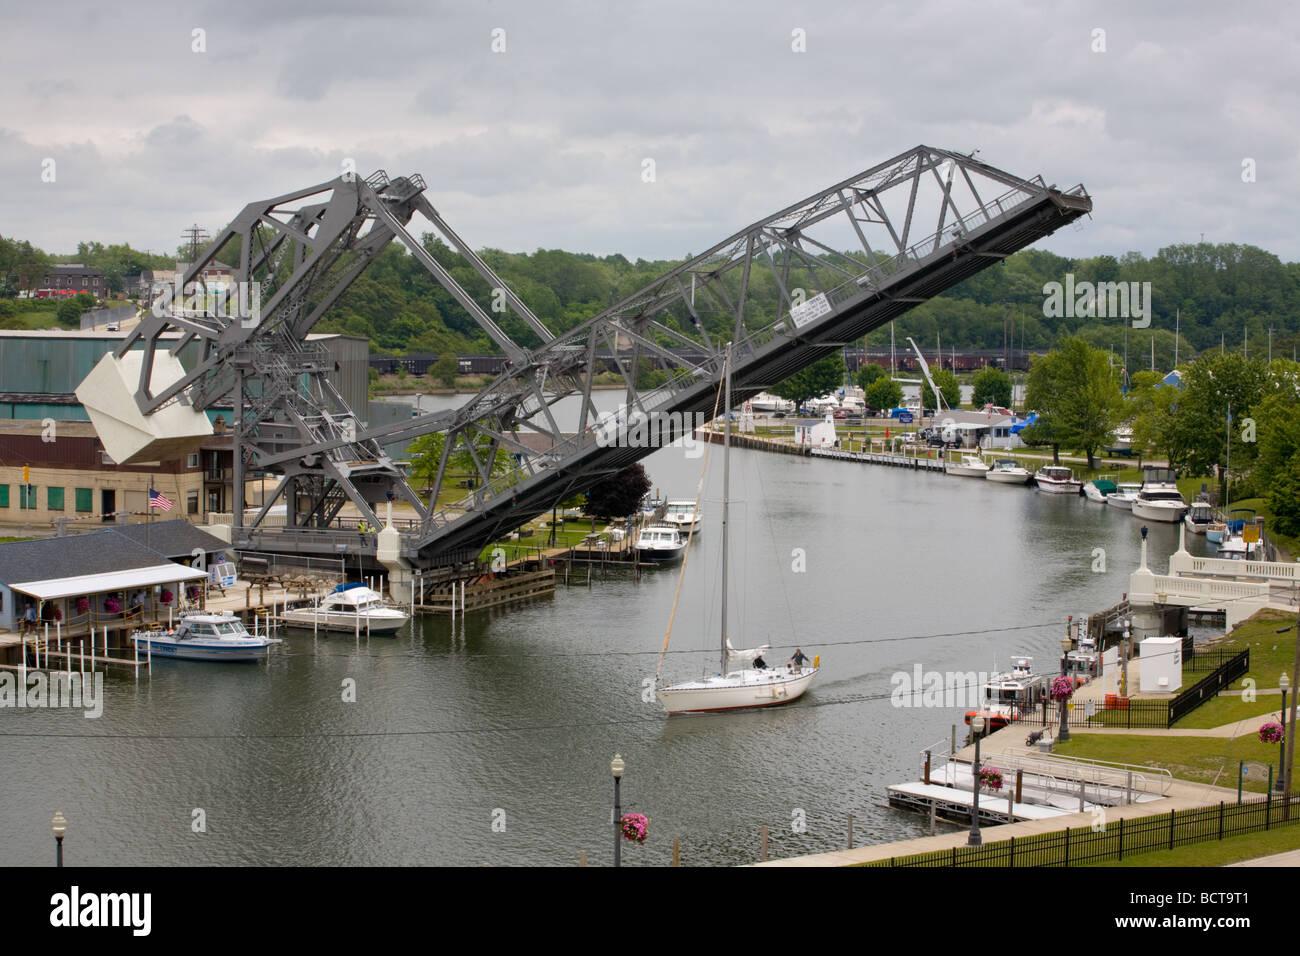 Bascule lift bridge is rare jackknife design Ashtabula Ohio - Stock Image